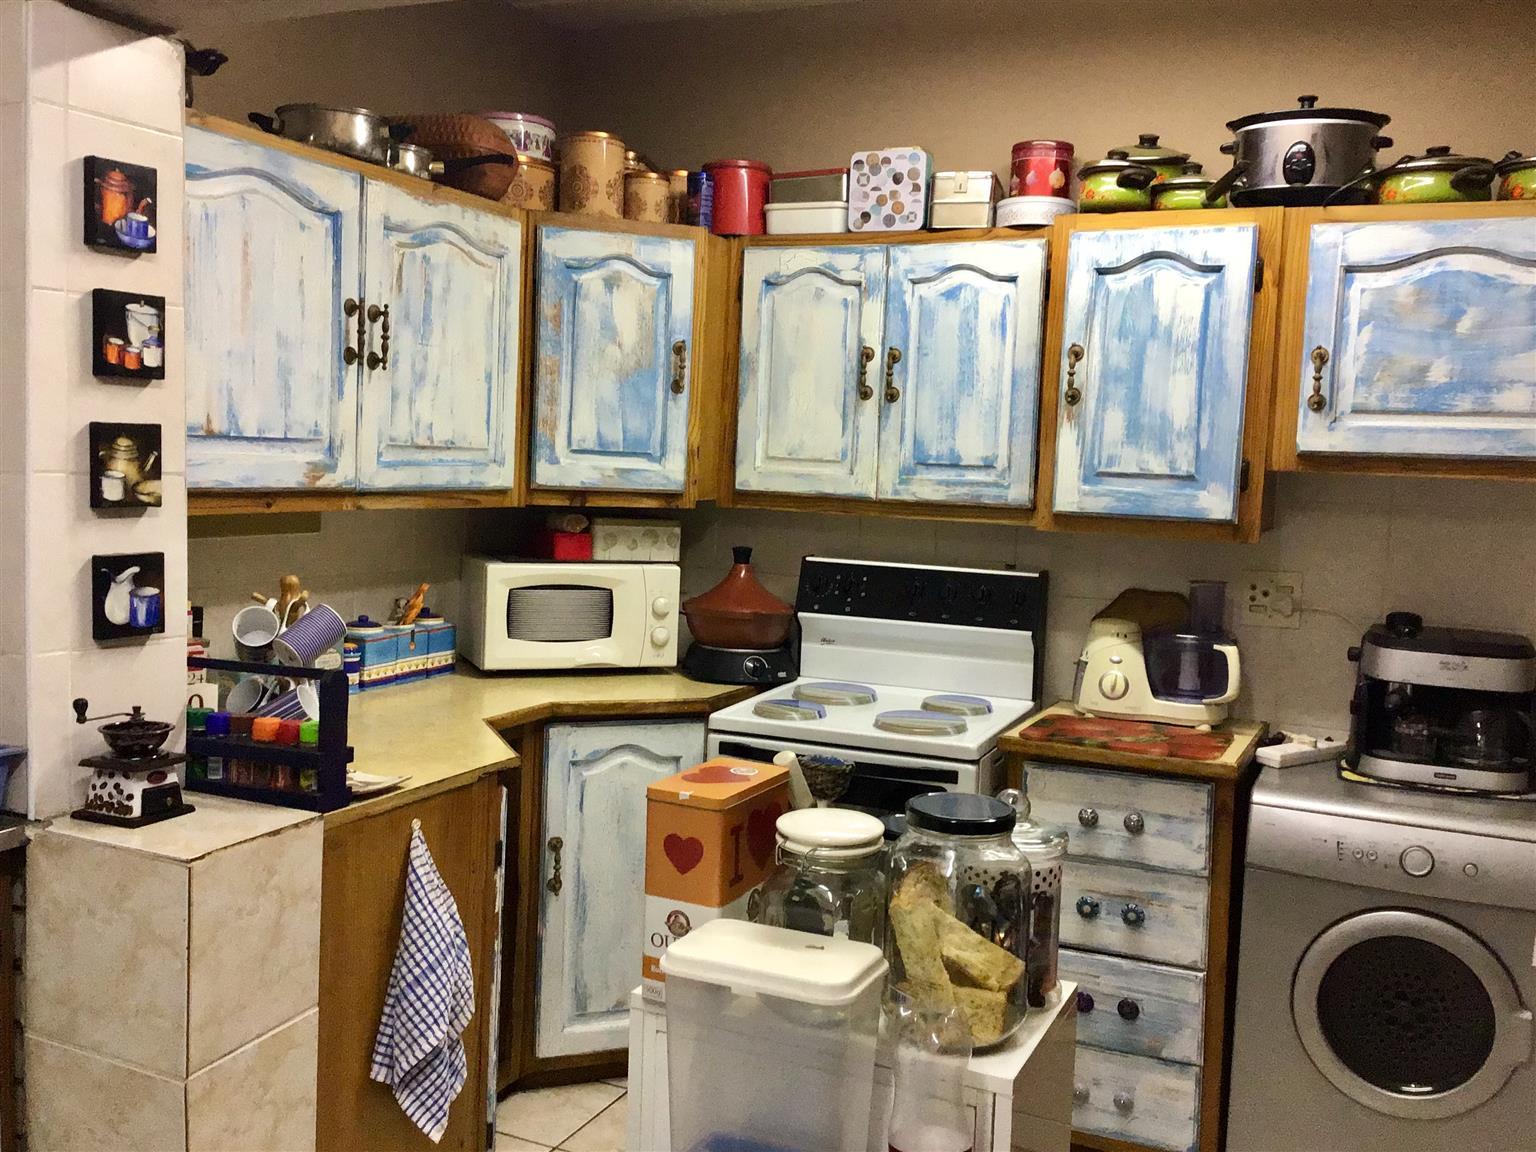 3Bdr Duplex for RENT - Silver Oaks, Silverton, Pretoria (Listed by Agent)